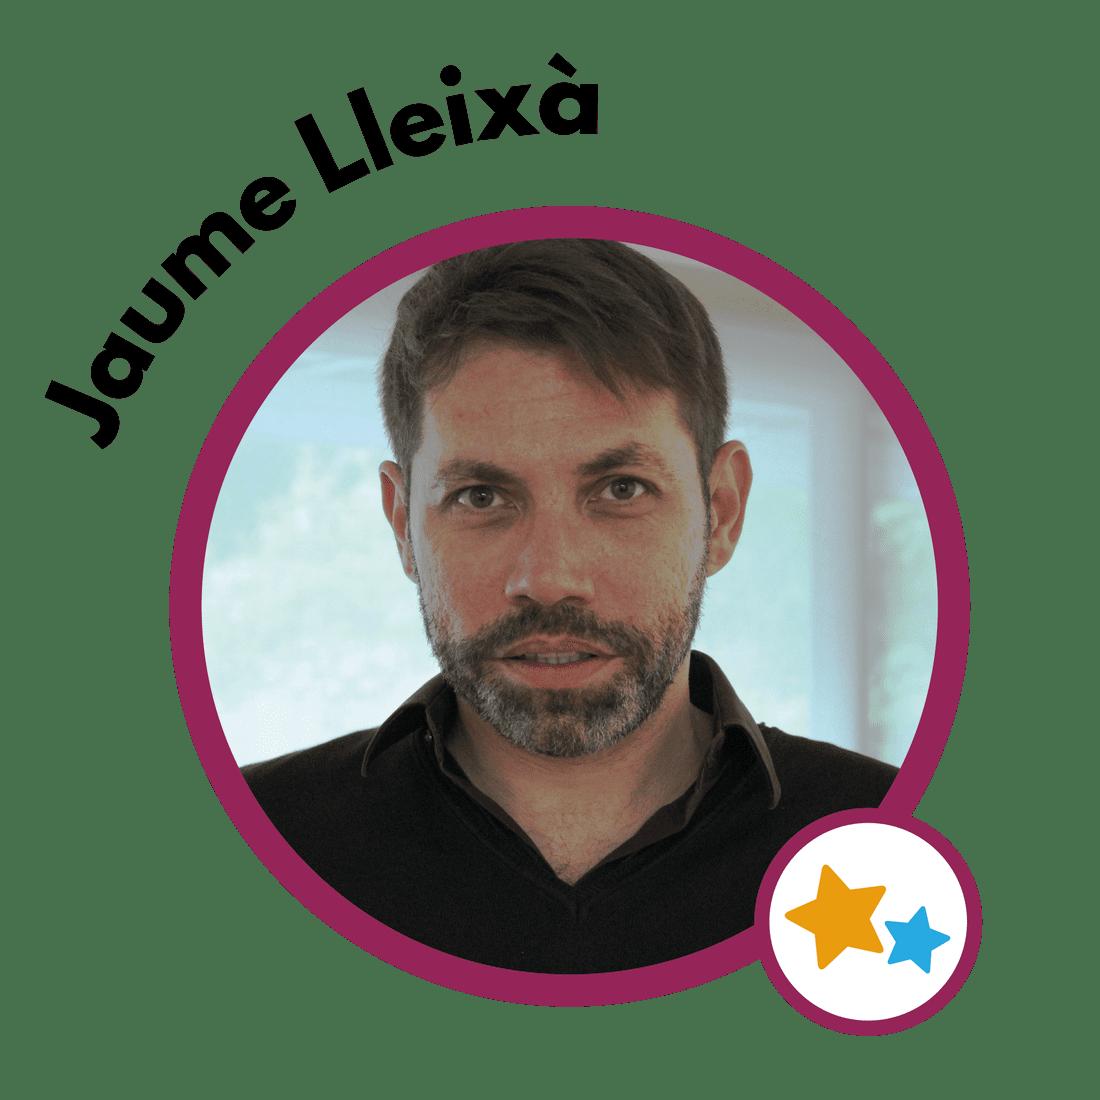 Jaume Lleixà - Creativation Talks 2018